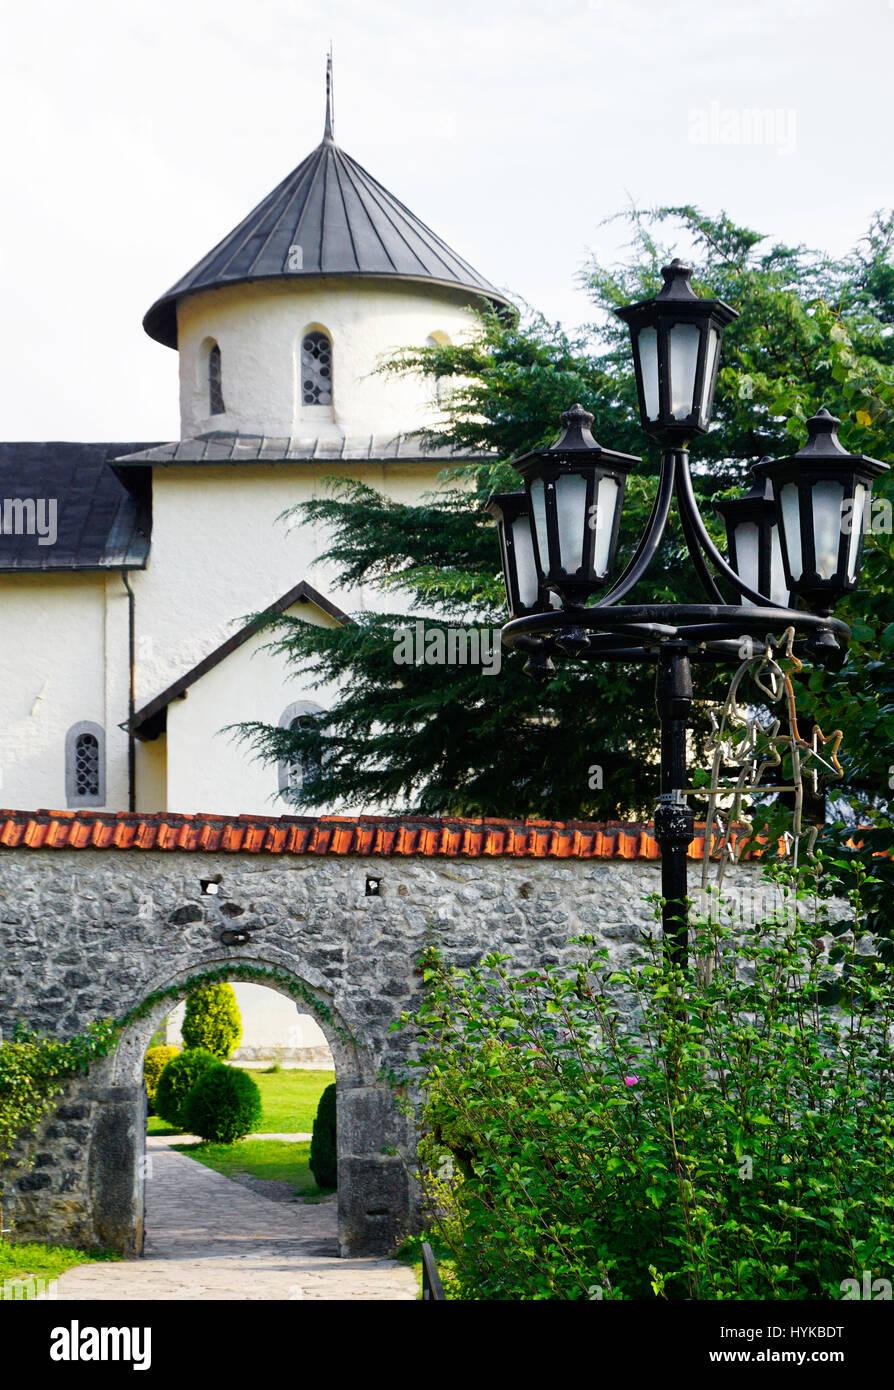 Gate to Moraca Monastery of the Serbian Orthodox Christian Church near Kolasin, Montenegro. - Stock Image